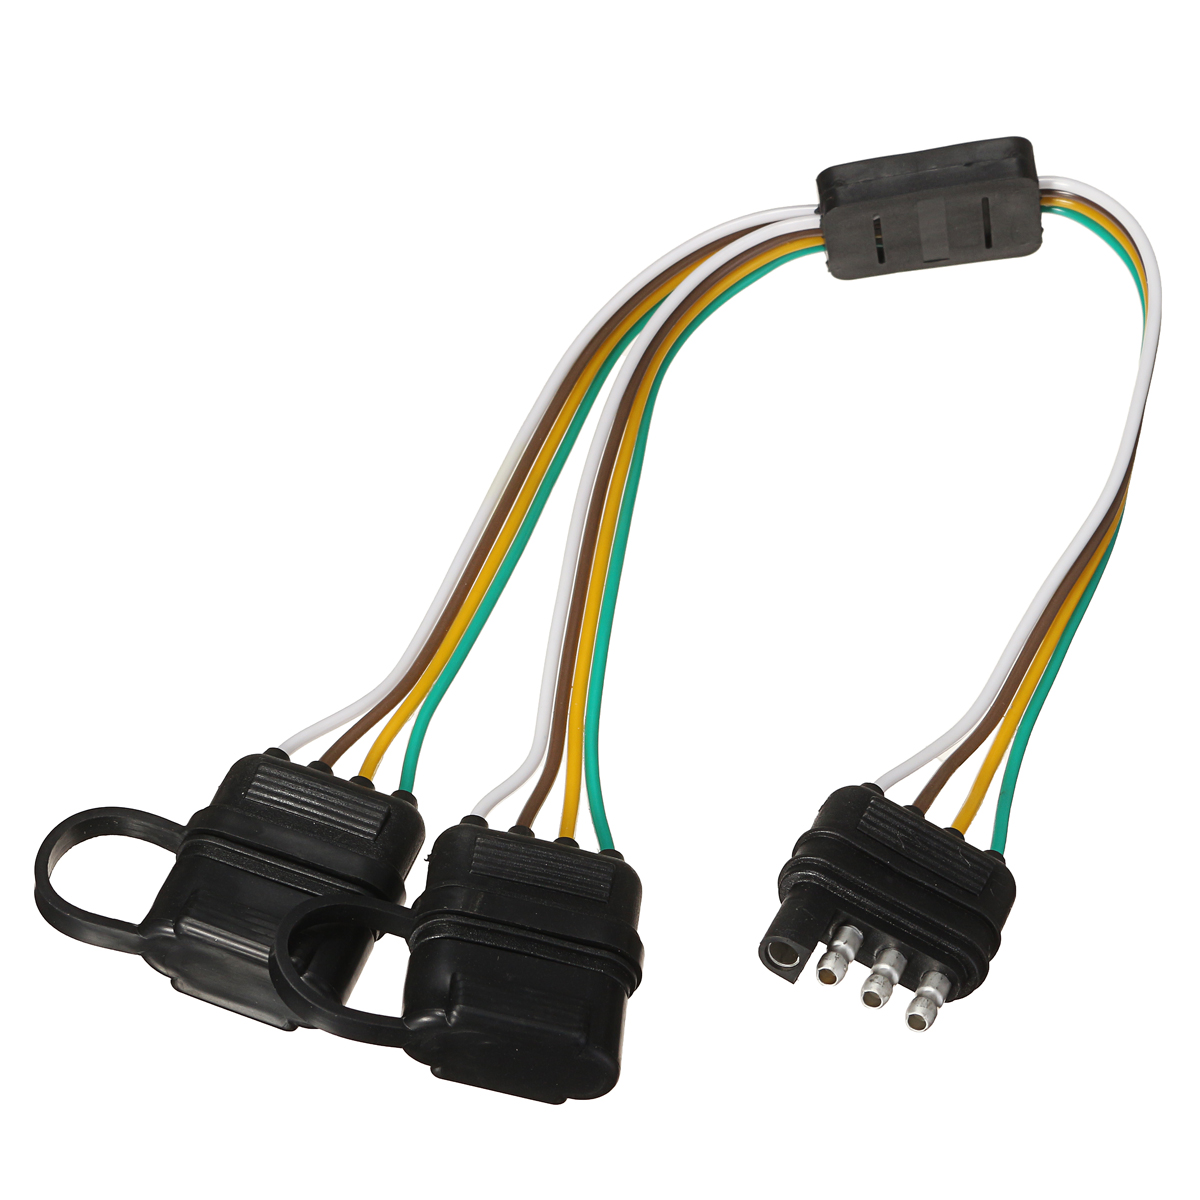 hight resolution of trailer splitter harness adapter 2 way 4pin y split for rear camera tailgate light